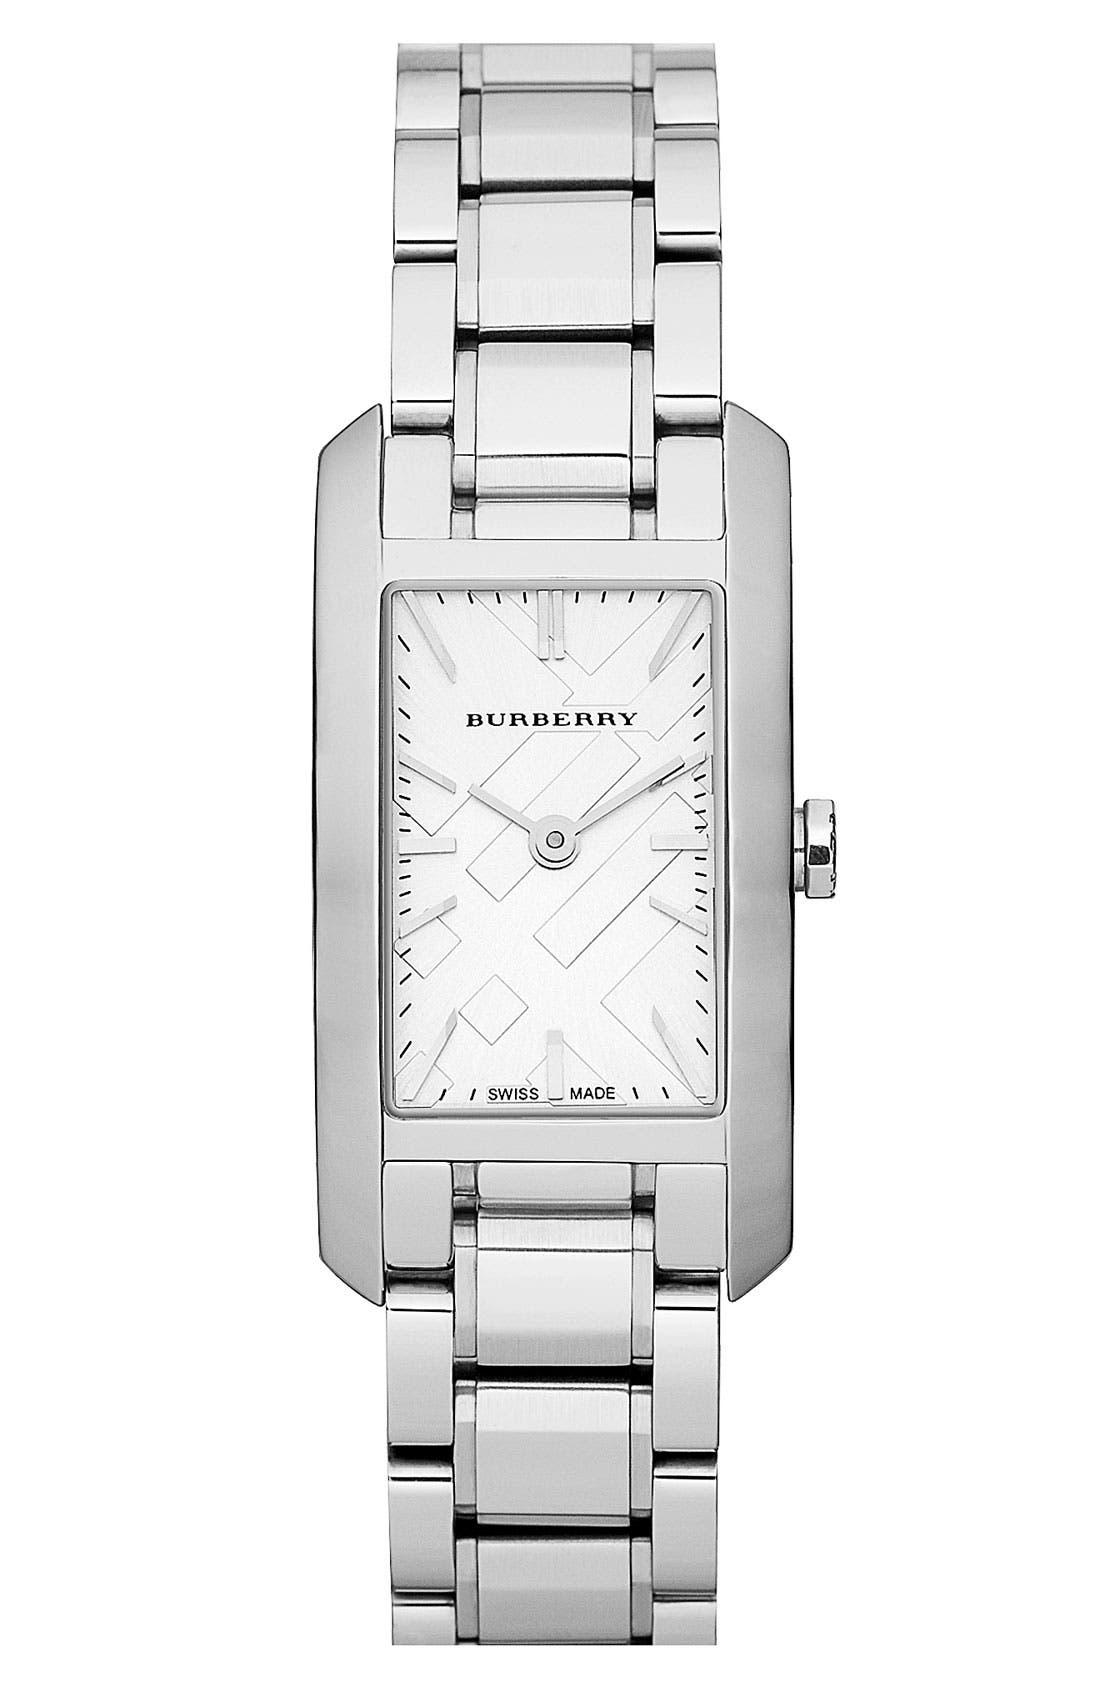 Alternate Image 1 Selected - Burberry Rectangular Bracelet Watch, 20mm x 26mm